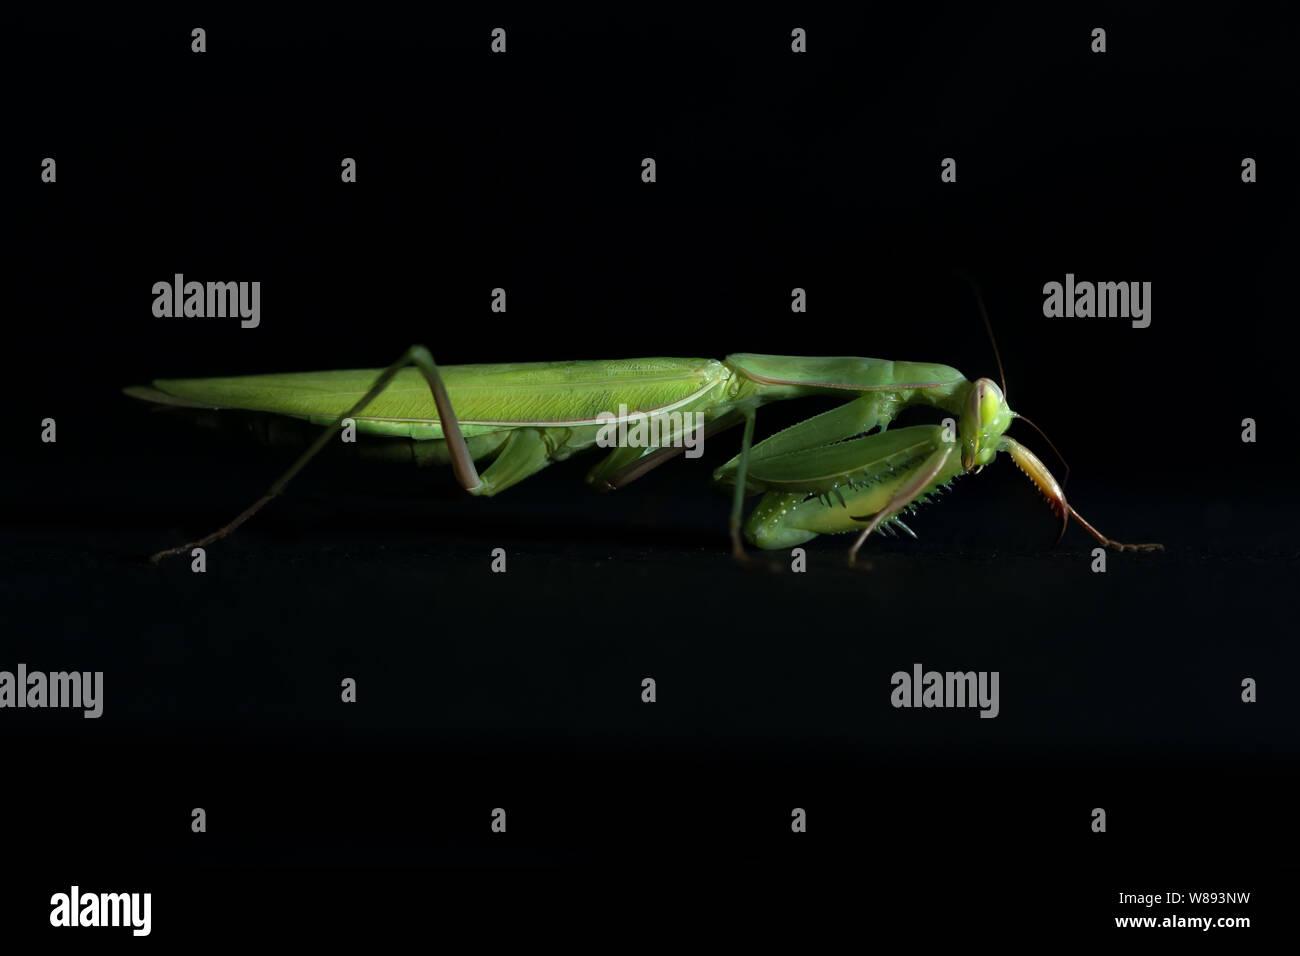 close view of green female mantis religiosa praying mantis on black background Stock Photo